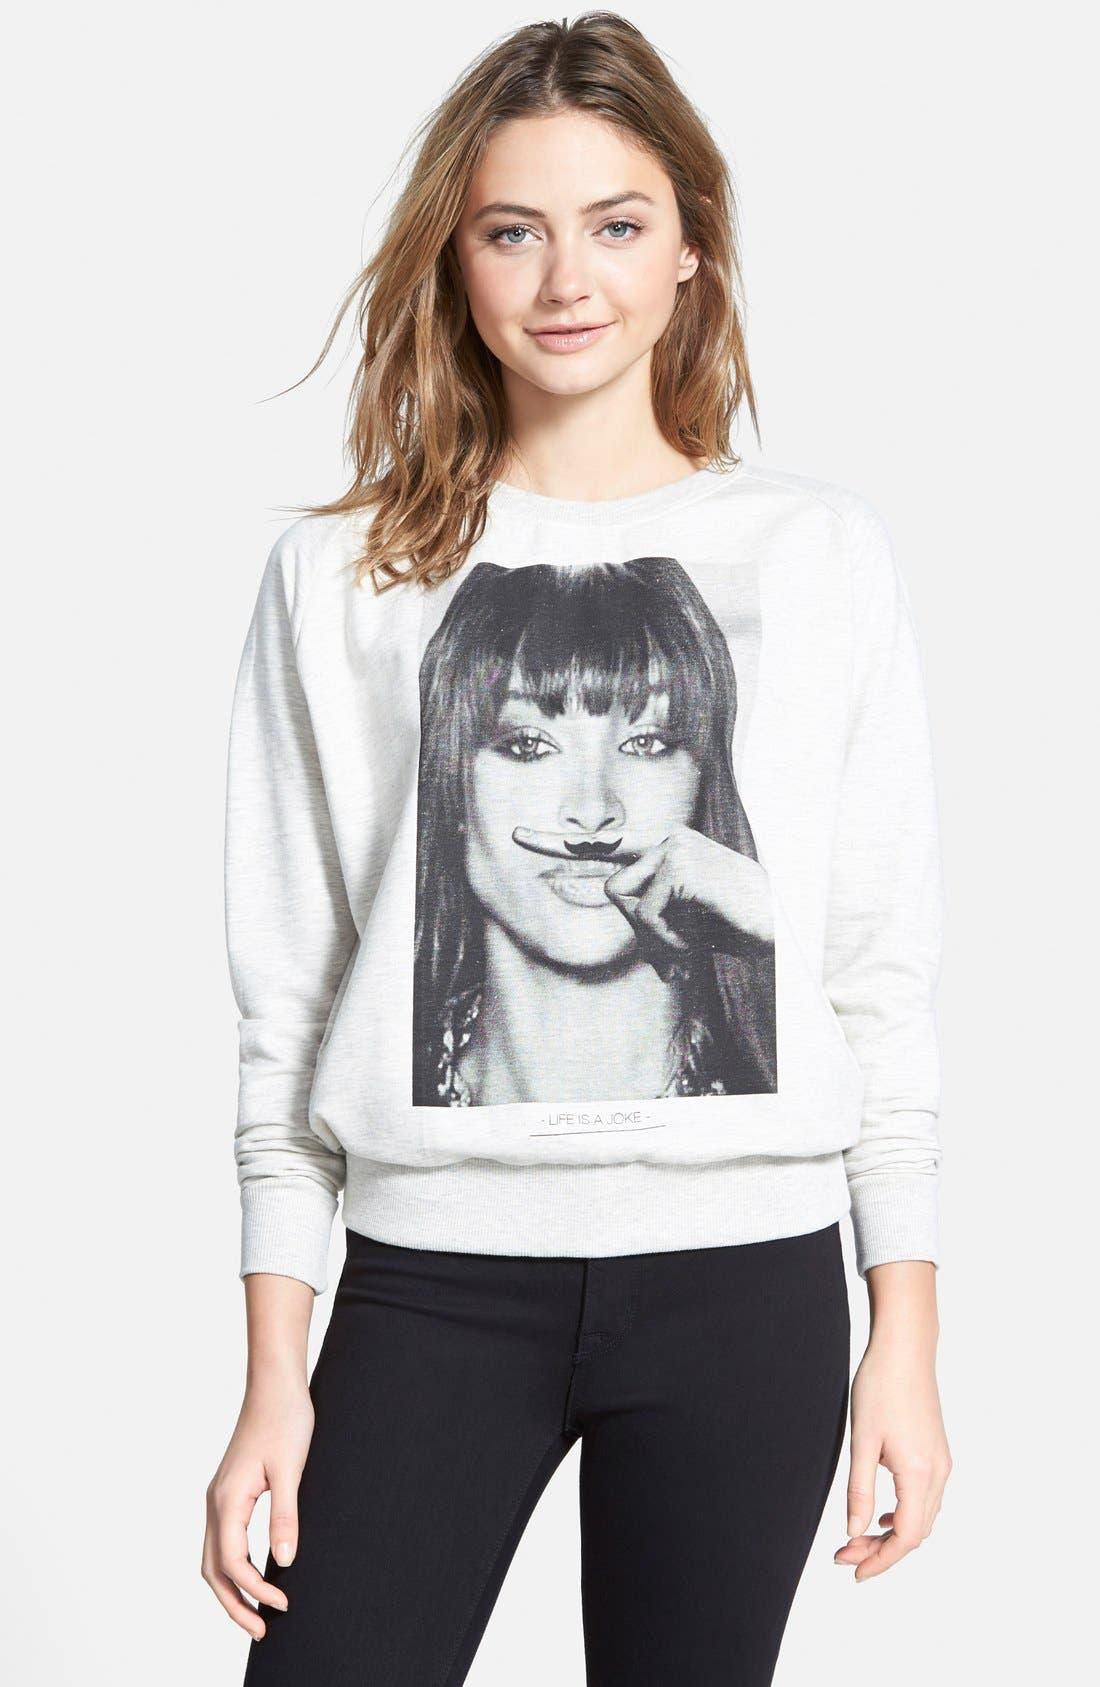 Alternate Image 1 Selected - ELEVENPARIS 'Life Is a Joke' Pullover Sweatshirt